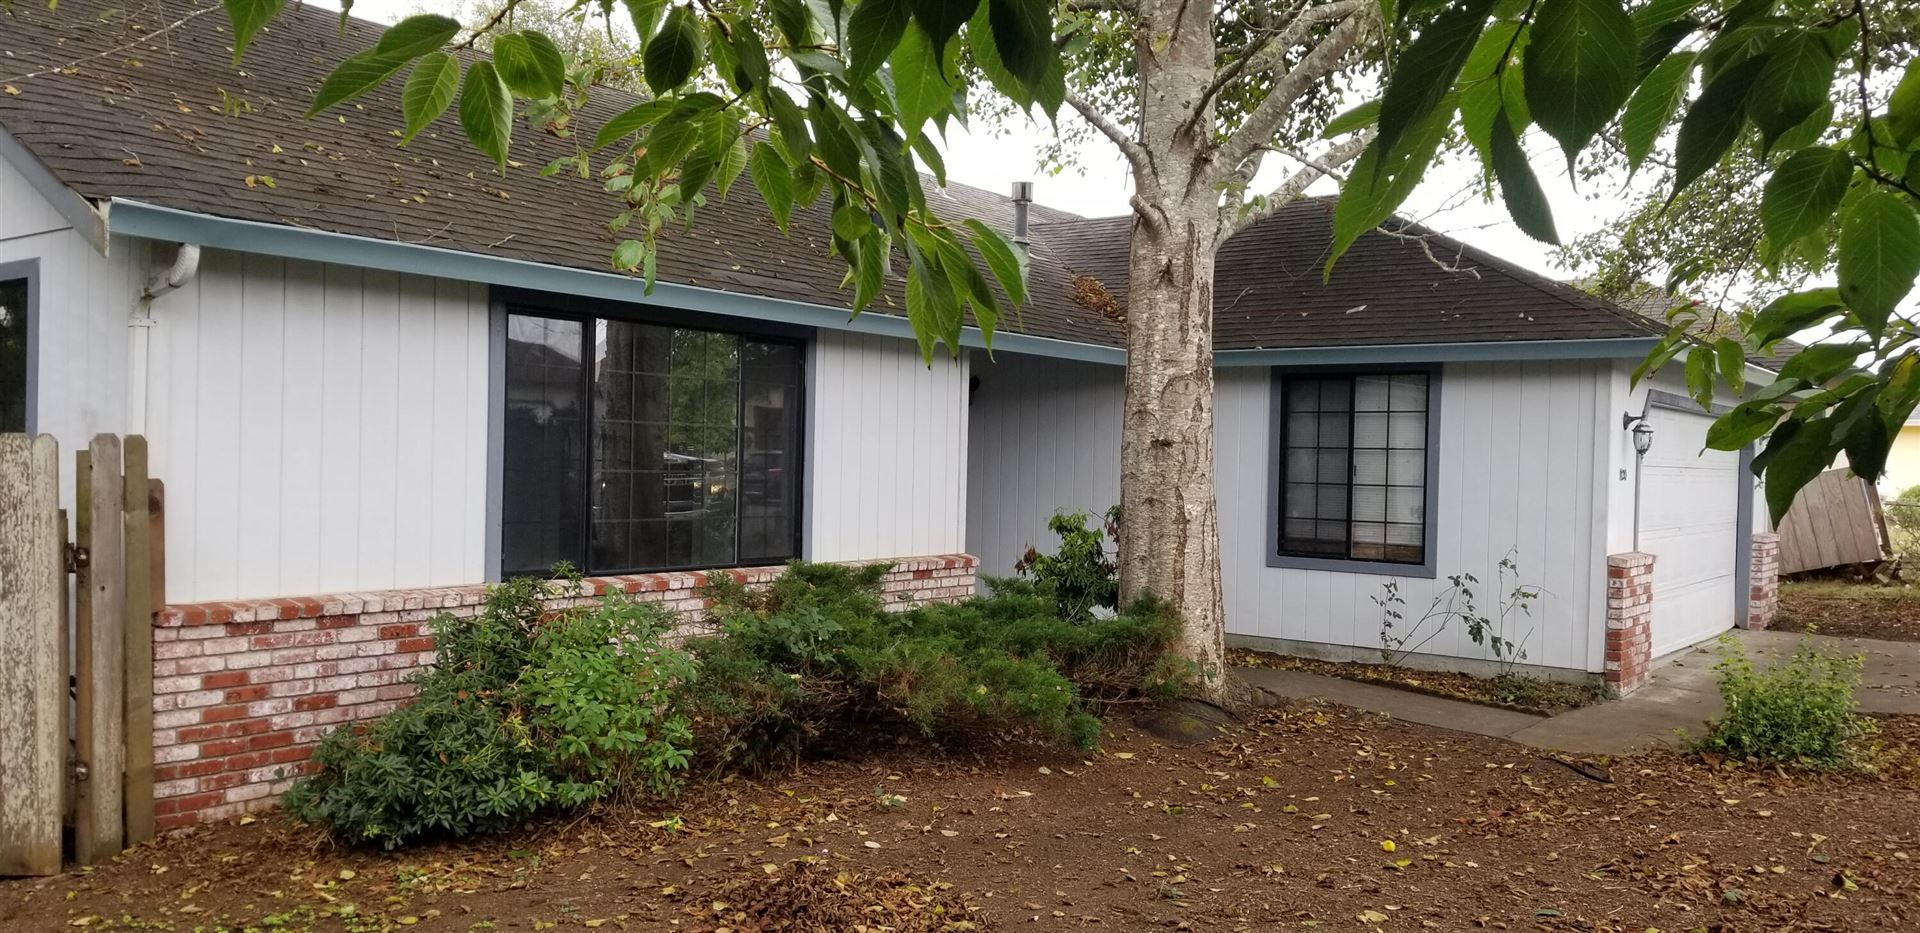 1120 Killdeer Road, McKinleyville, CA 95519 - MLS#: 260266